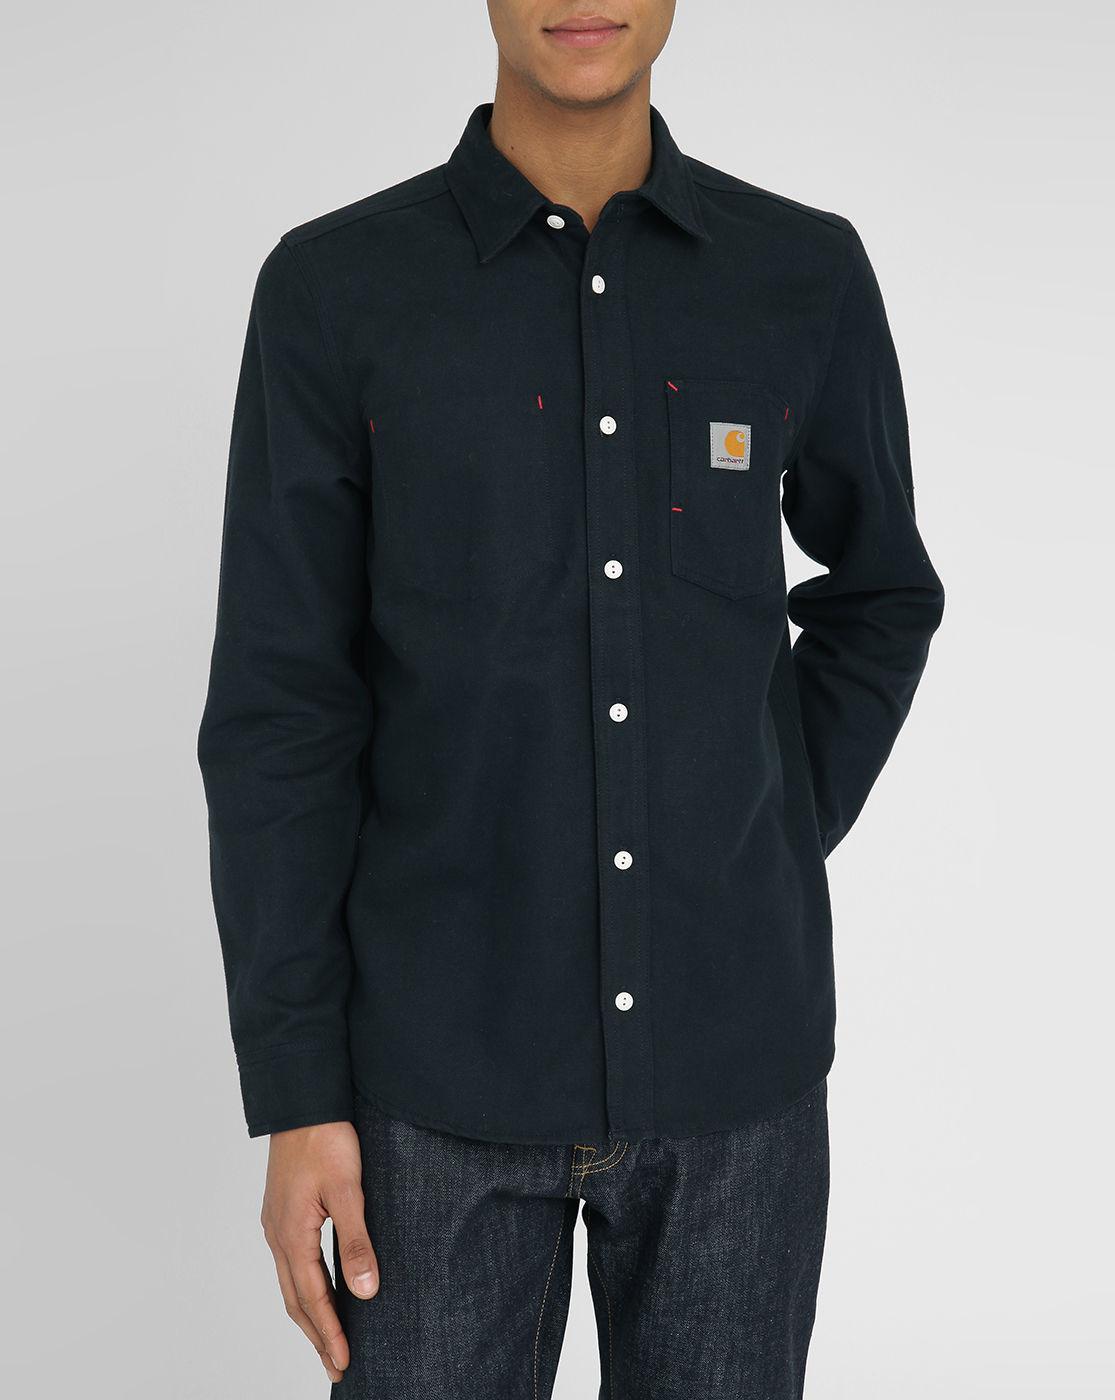 Carhartt tony navy twill shirt with italian collar in blue for Tony collar dress shirt